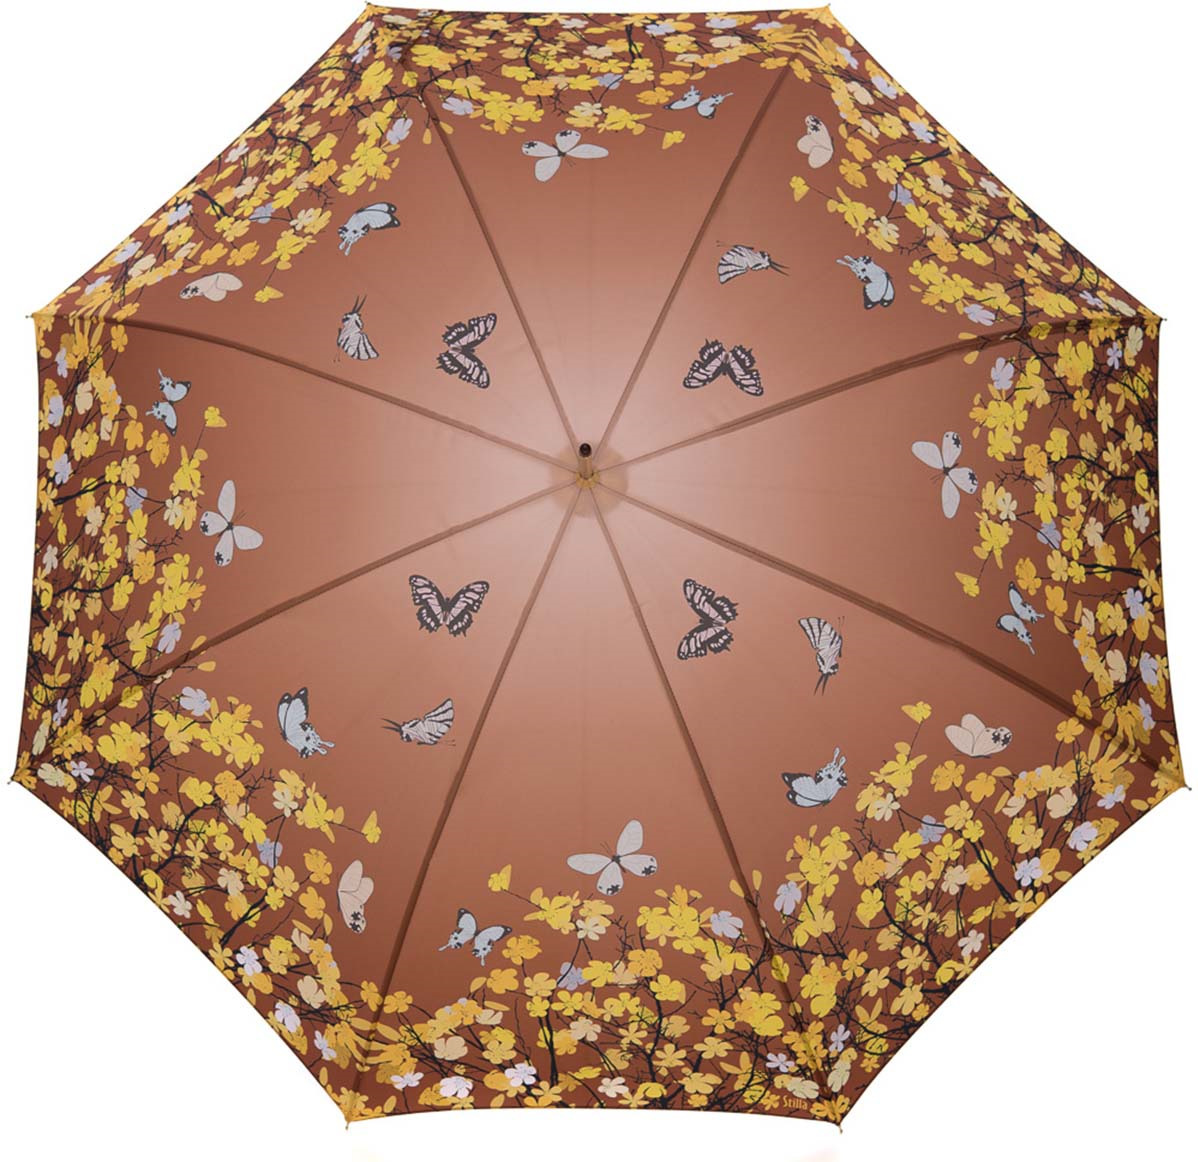 Зонт-трость женский Stilla, цвет: коричневый, желтый. 741/1 auto зонт stilla 680auto 1 светло коричневый